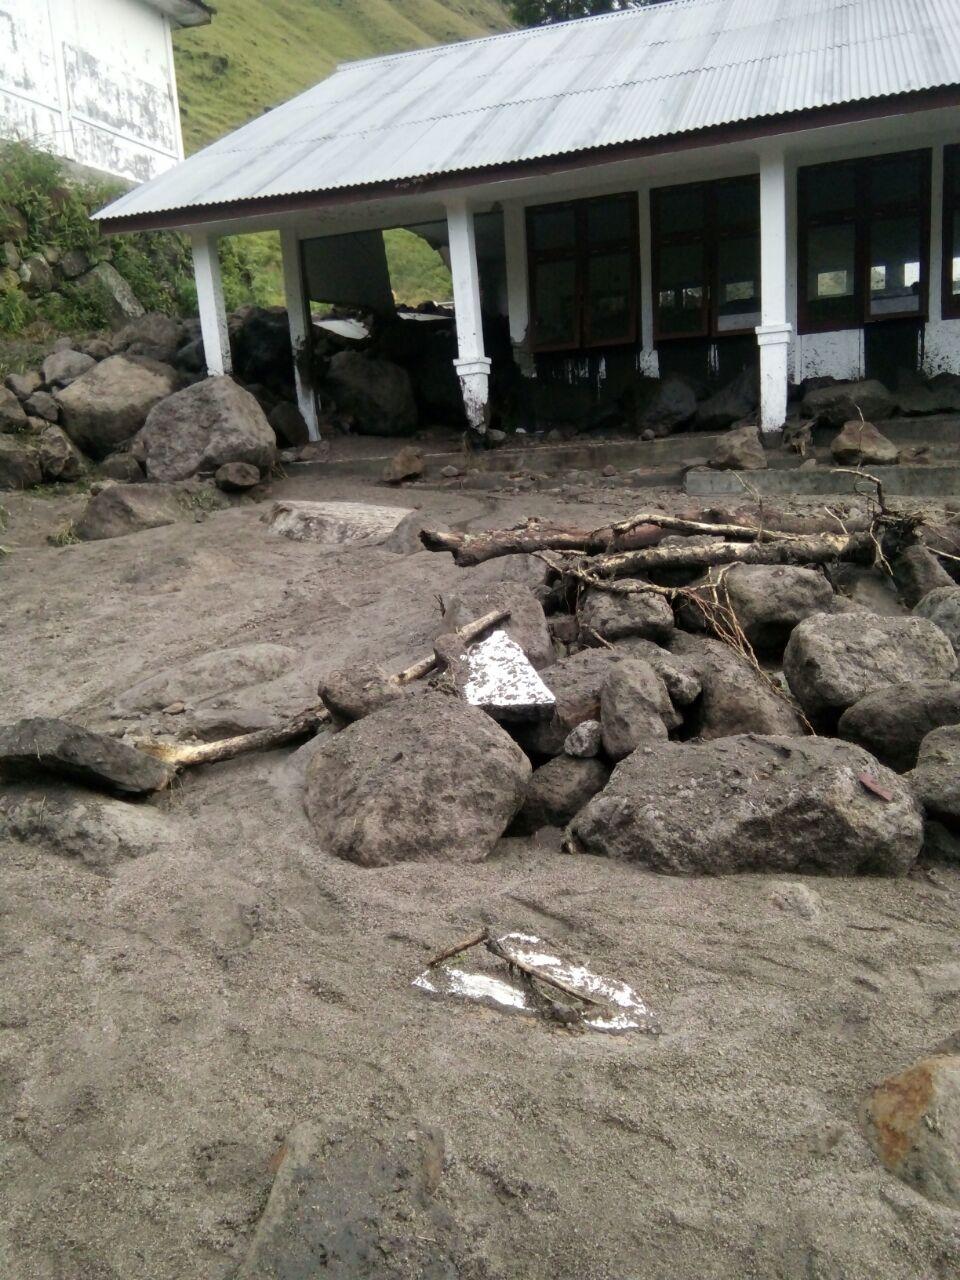 Foto: Gedung LAB SMP Negeri 2 satu atap Sianjur Mula-Mula yang terkena banjir bandang di Desa Bonan Dolok kecamatan Sianjur Mula-Mula, Kamis (8/3)